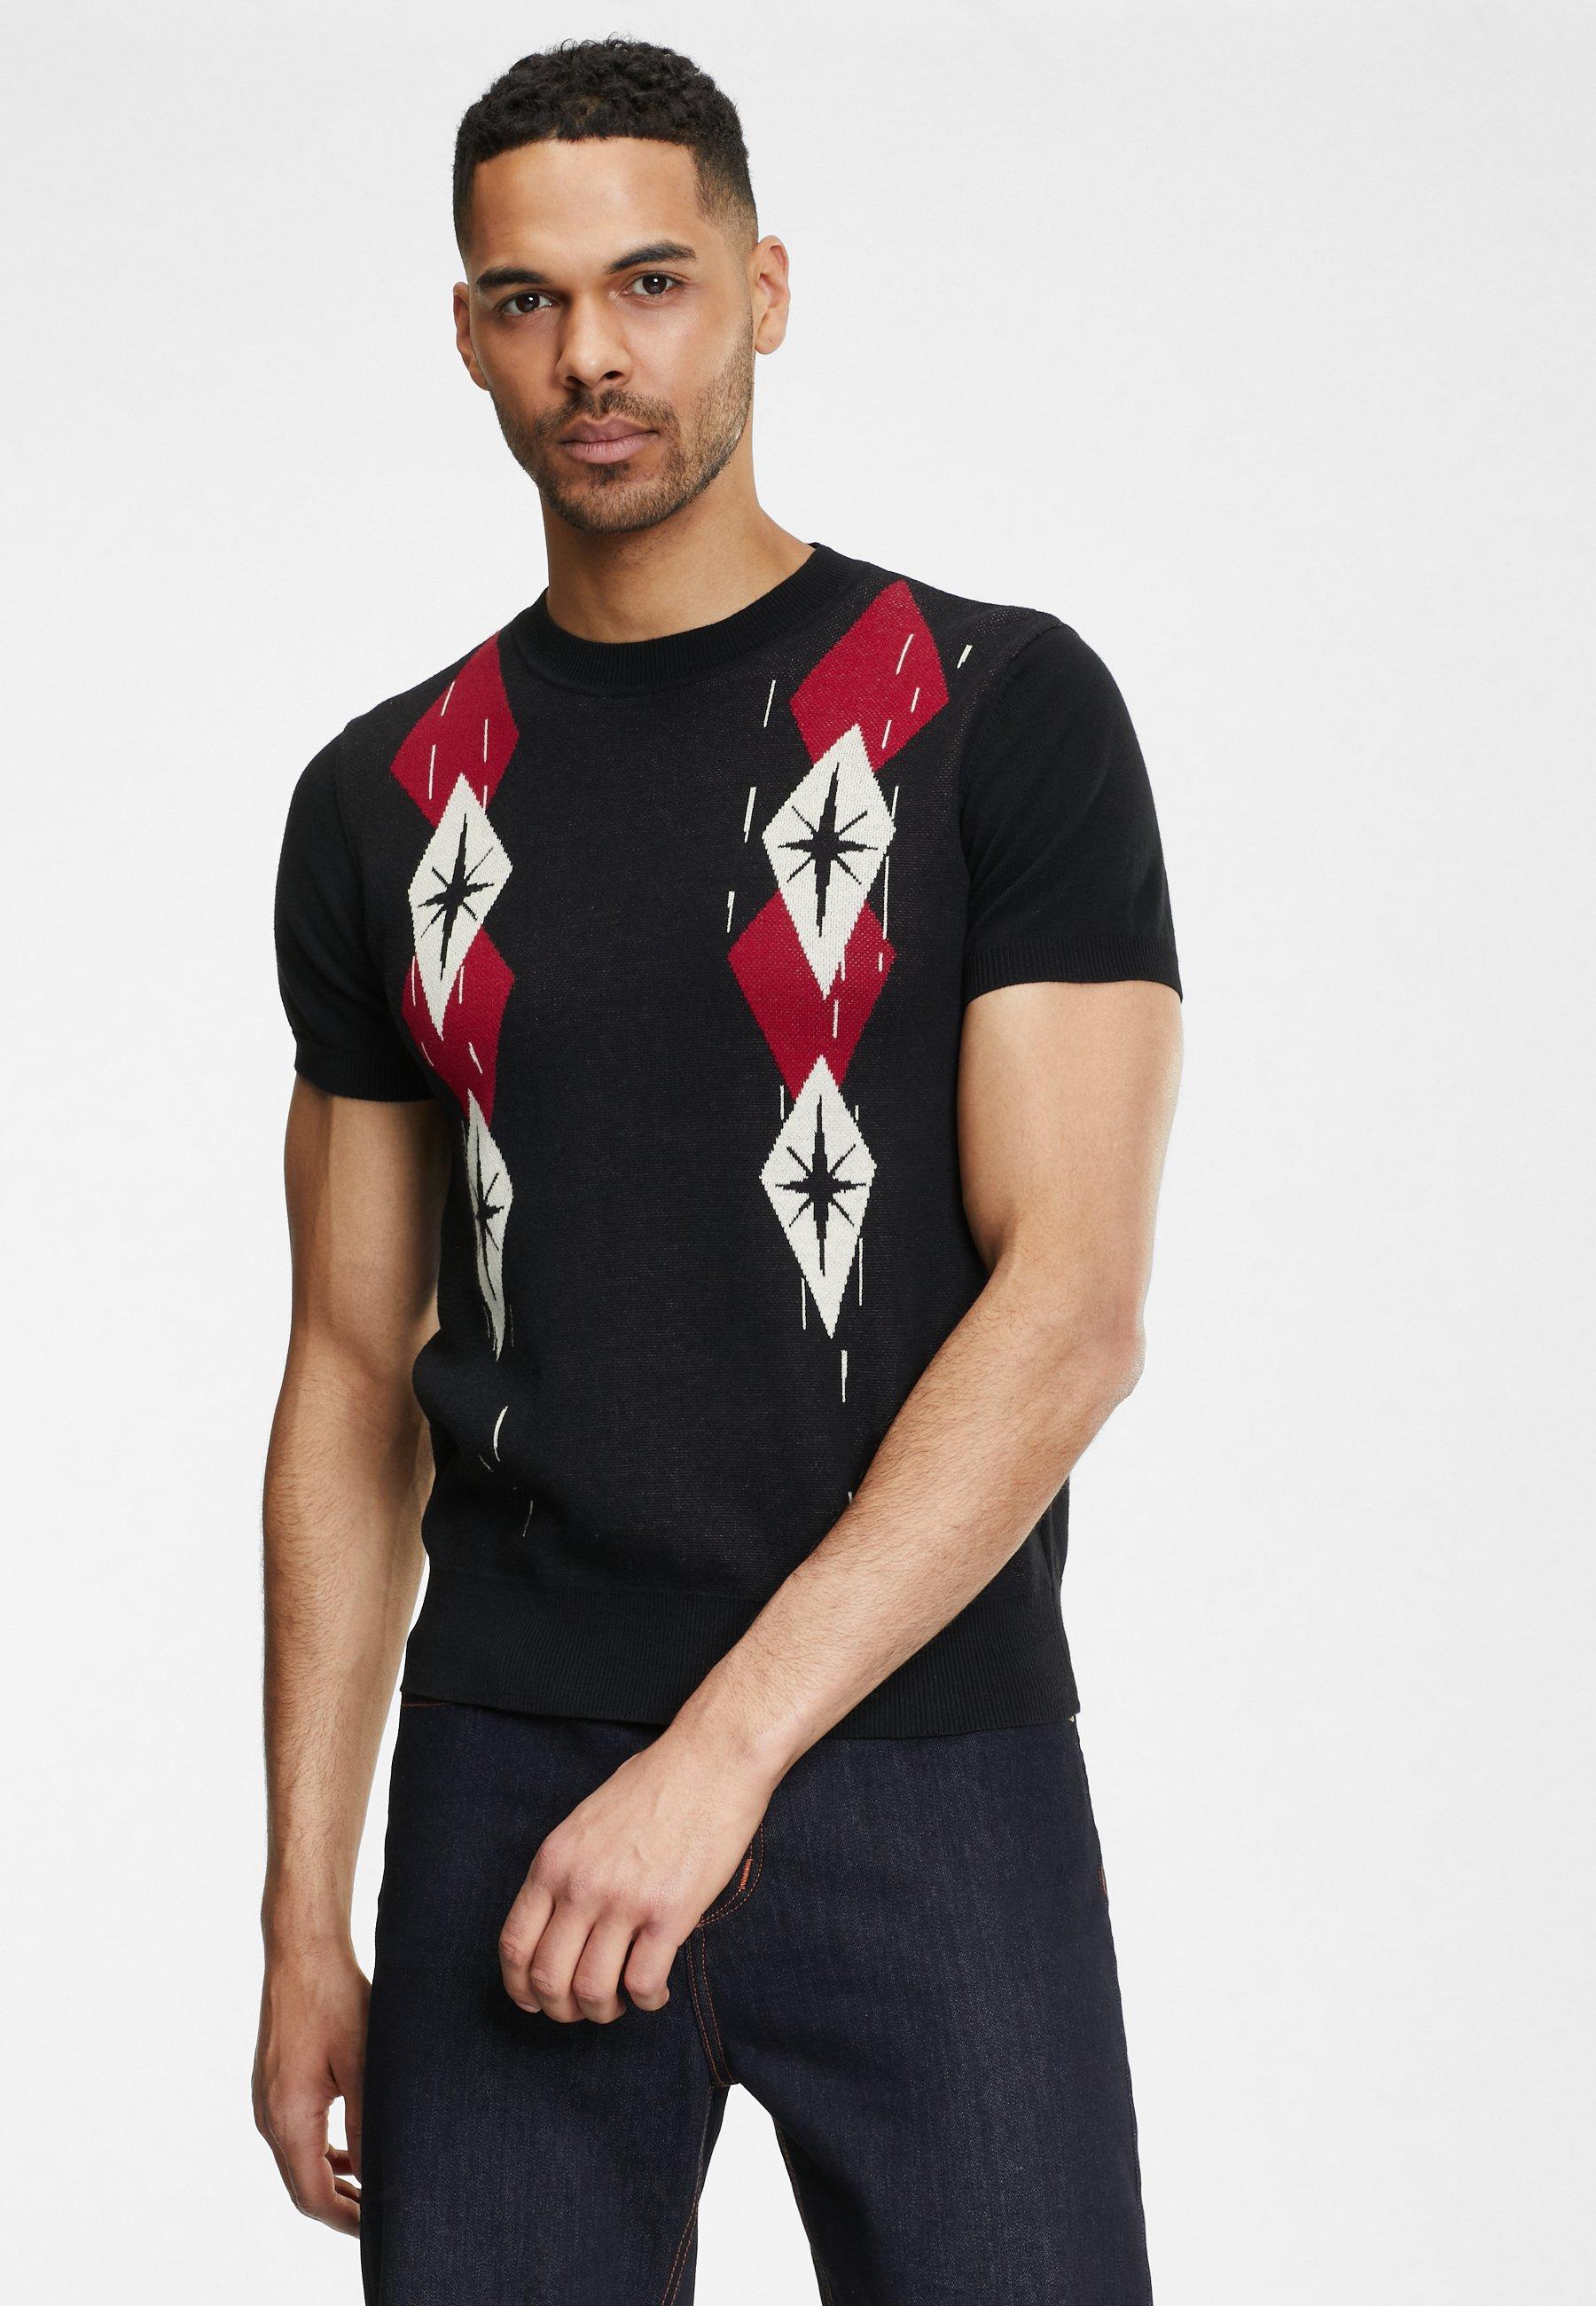 Uomo SCOTT BLACK WALL - T-shirt con stampa